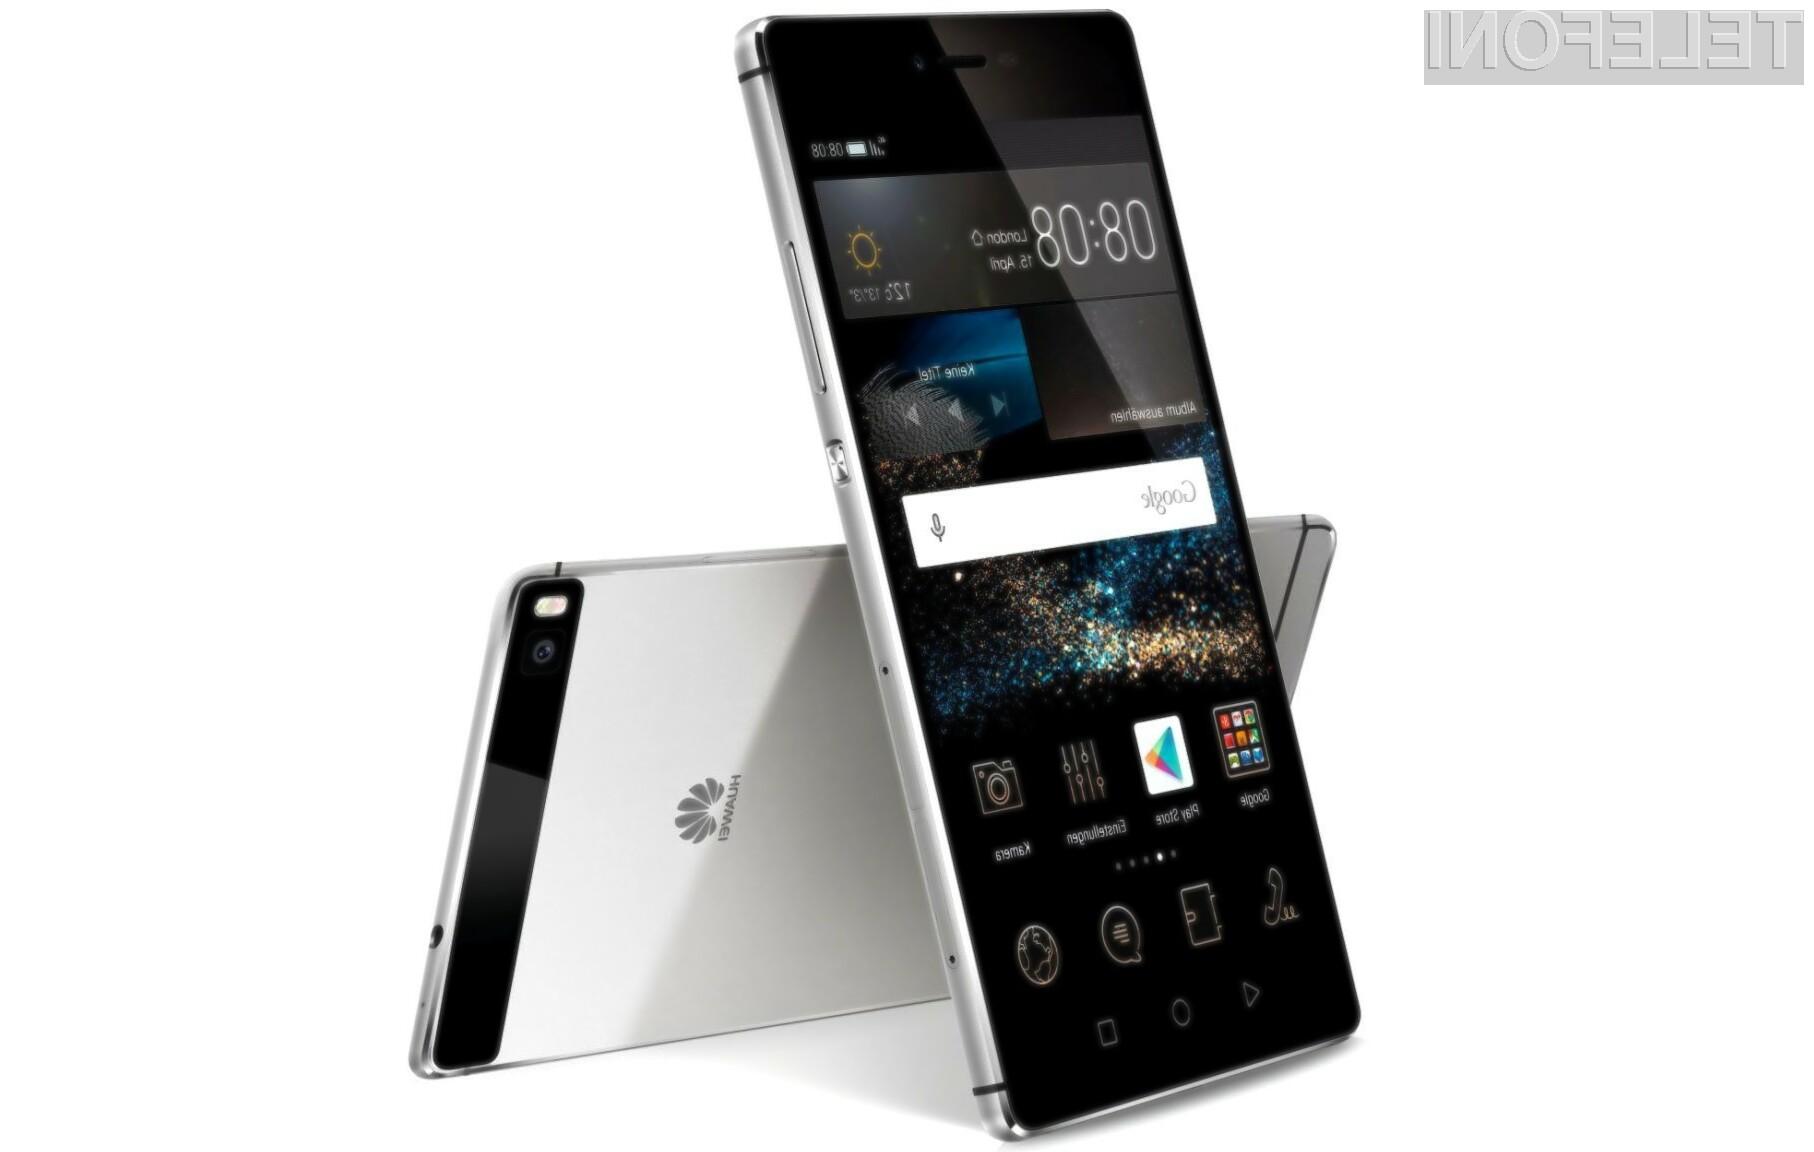 Pametni mobilni telefon Huawei P9 obeta veliko!